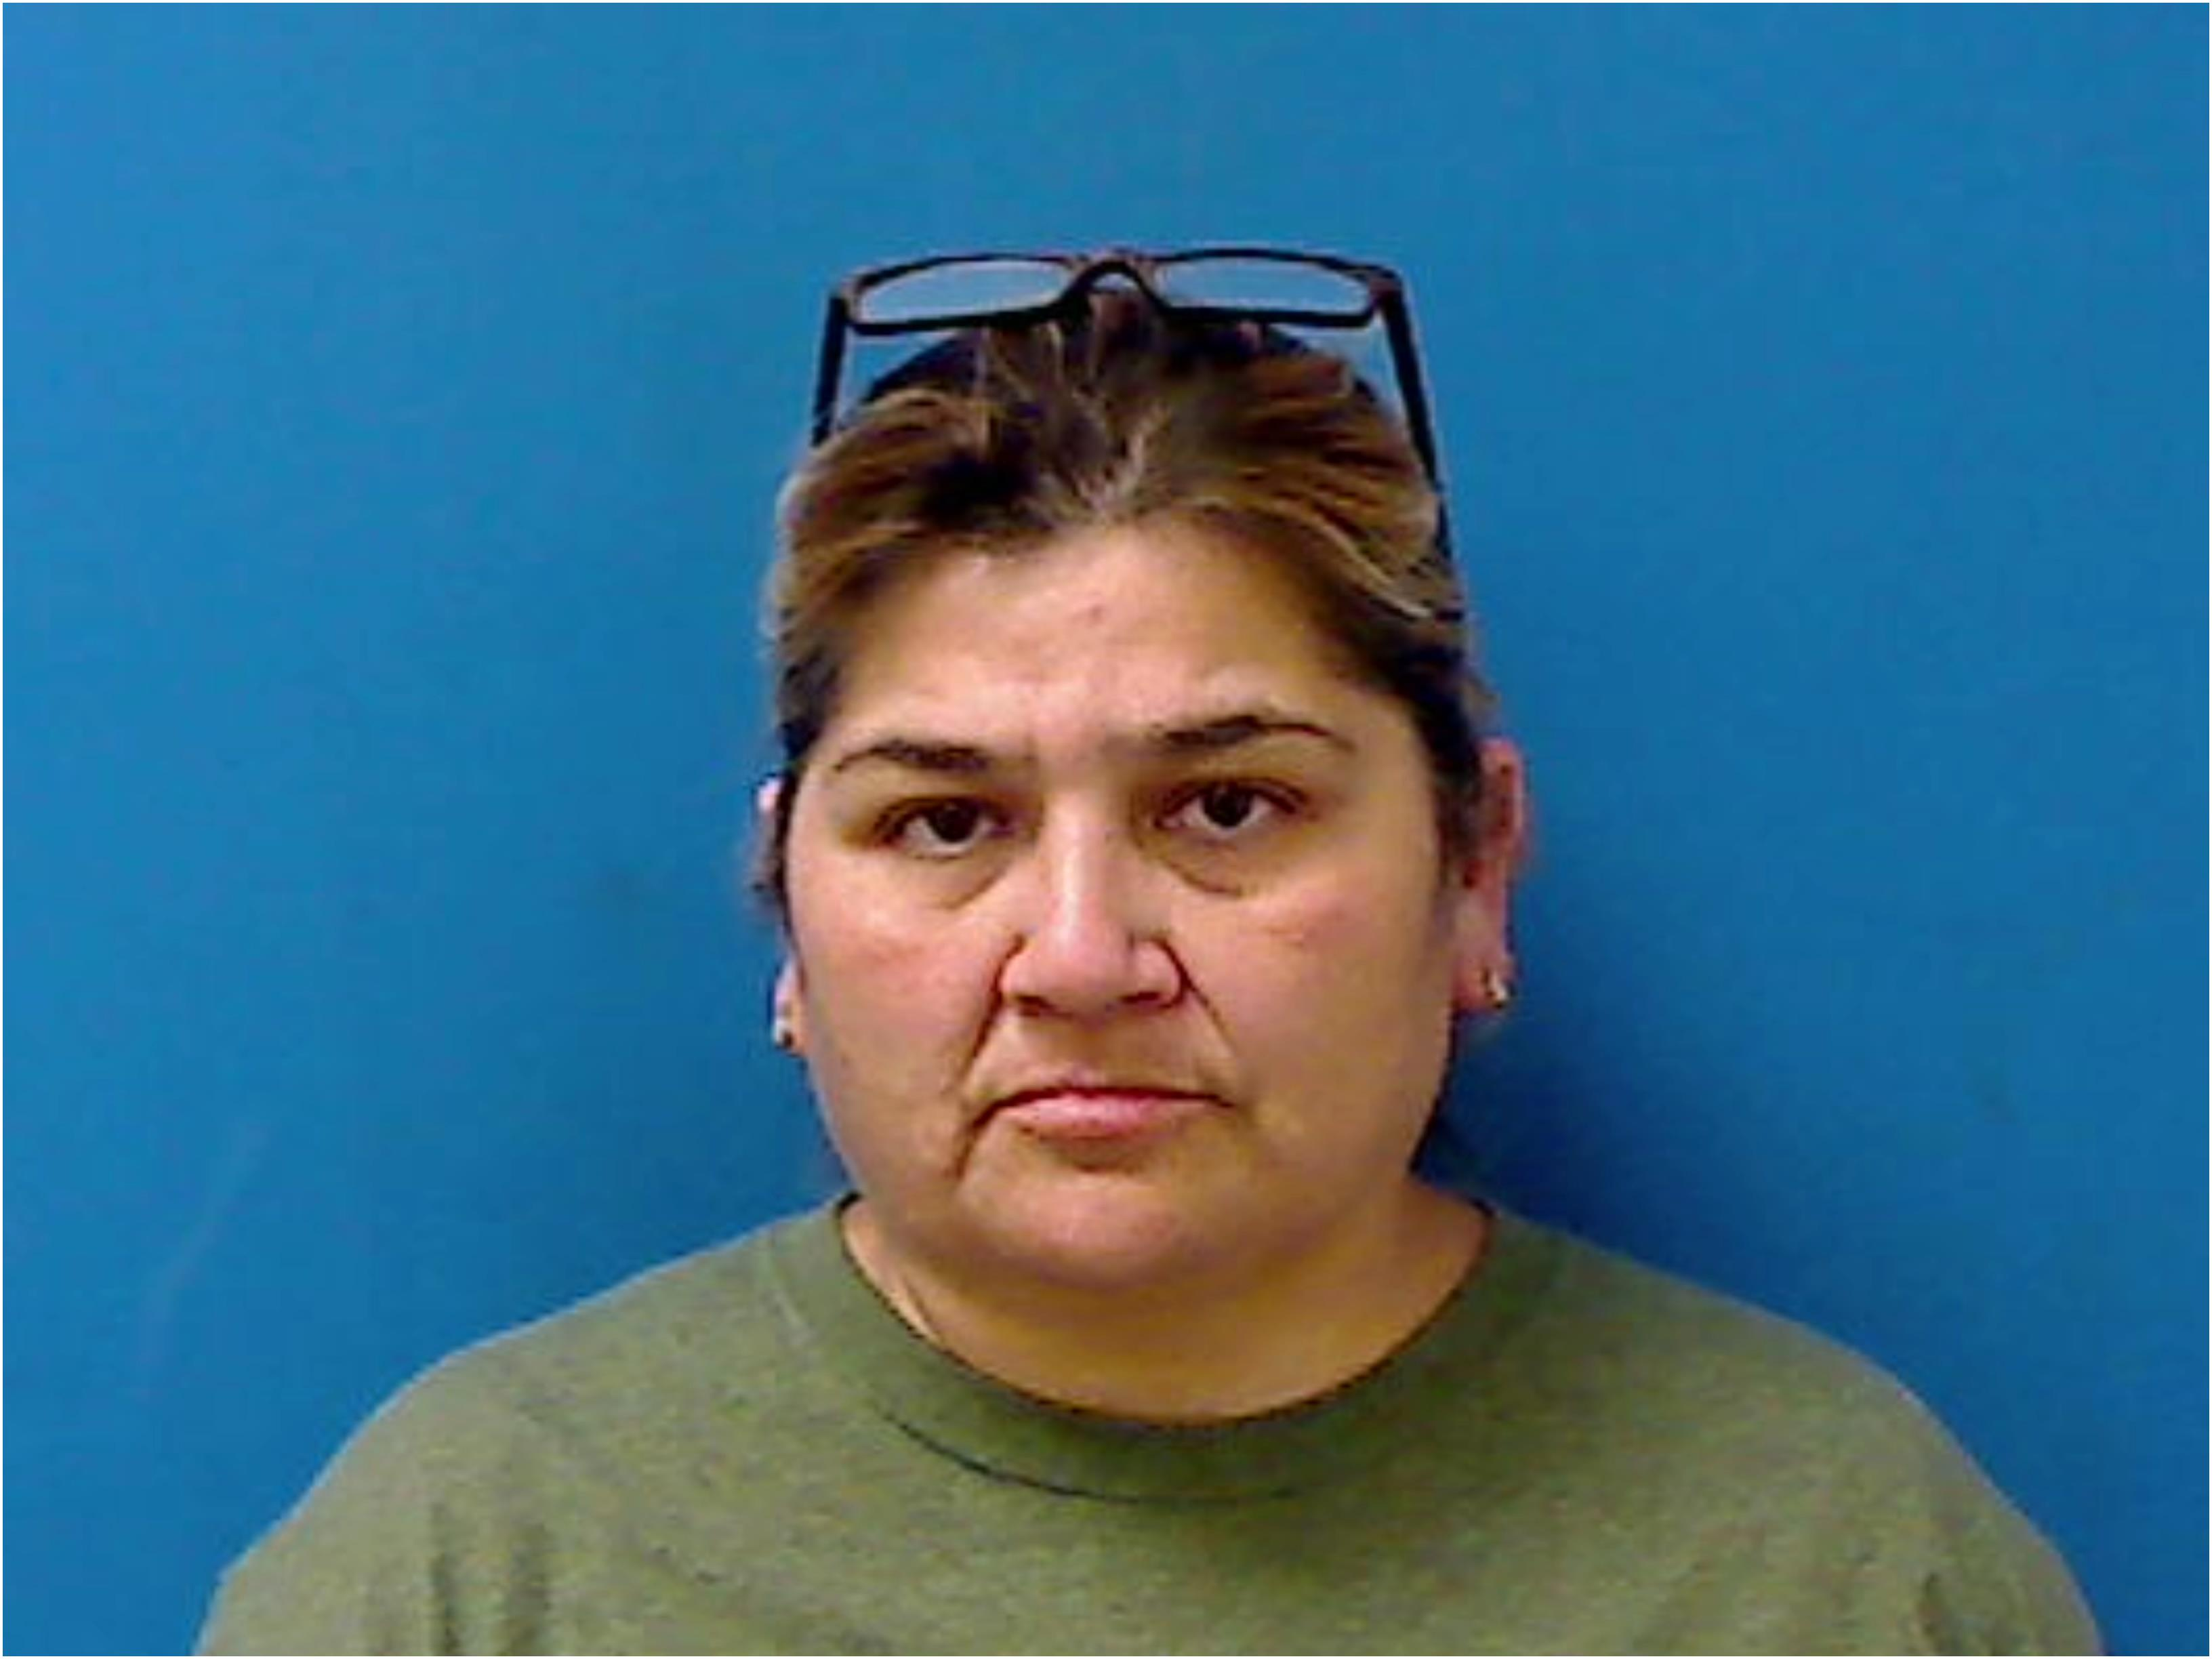 Defendant Nereyda Salazar